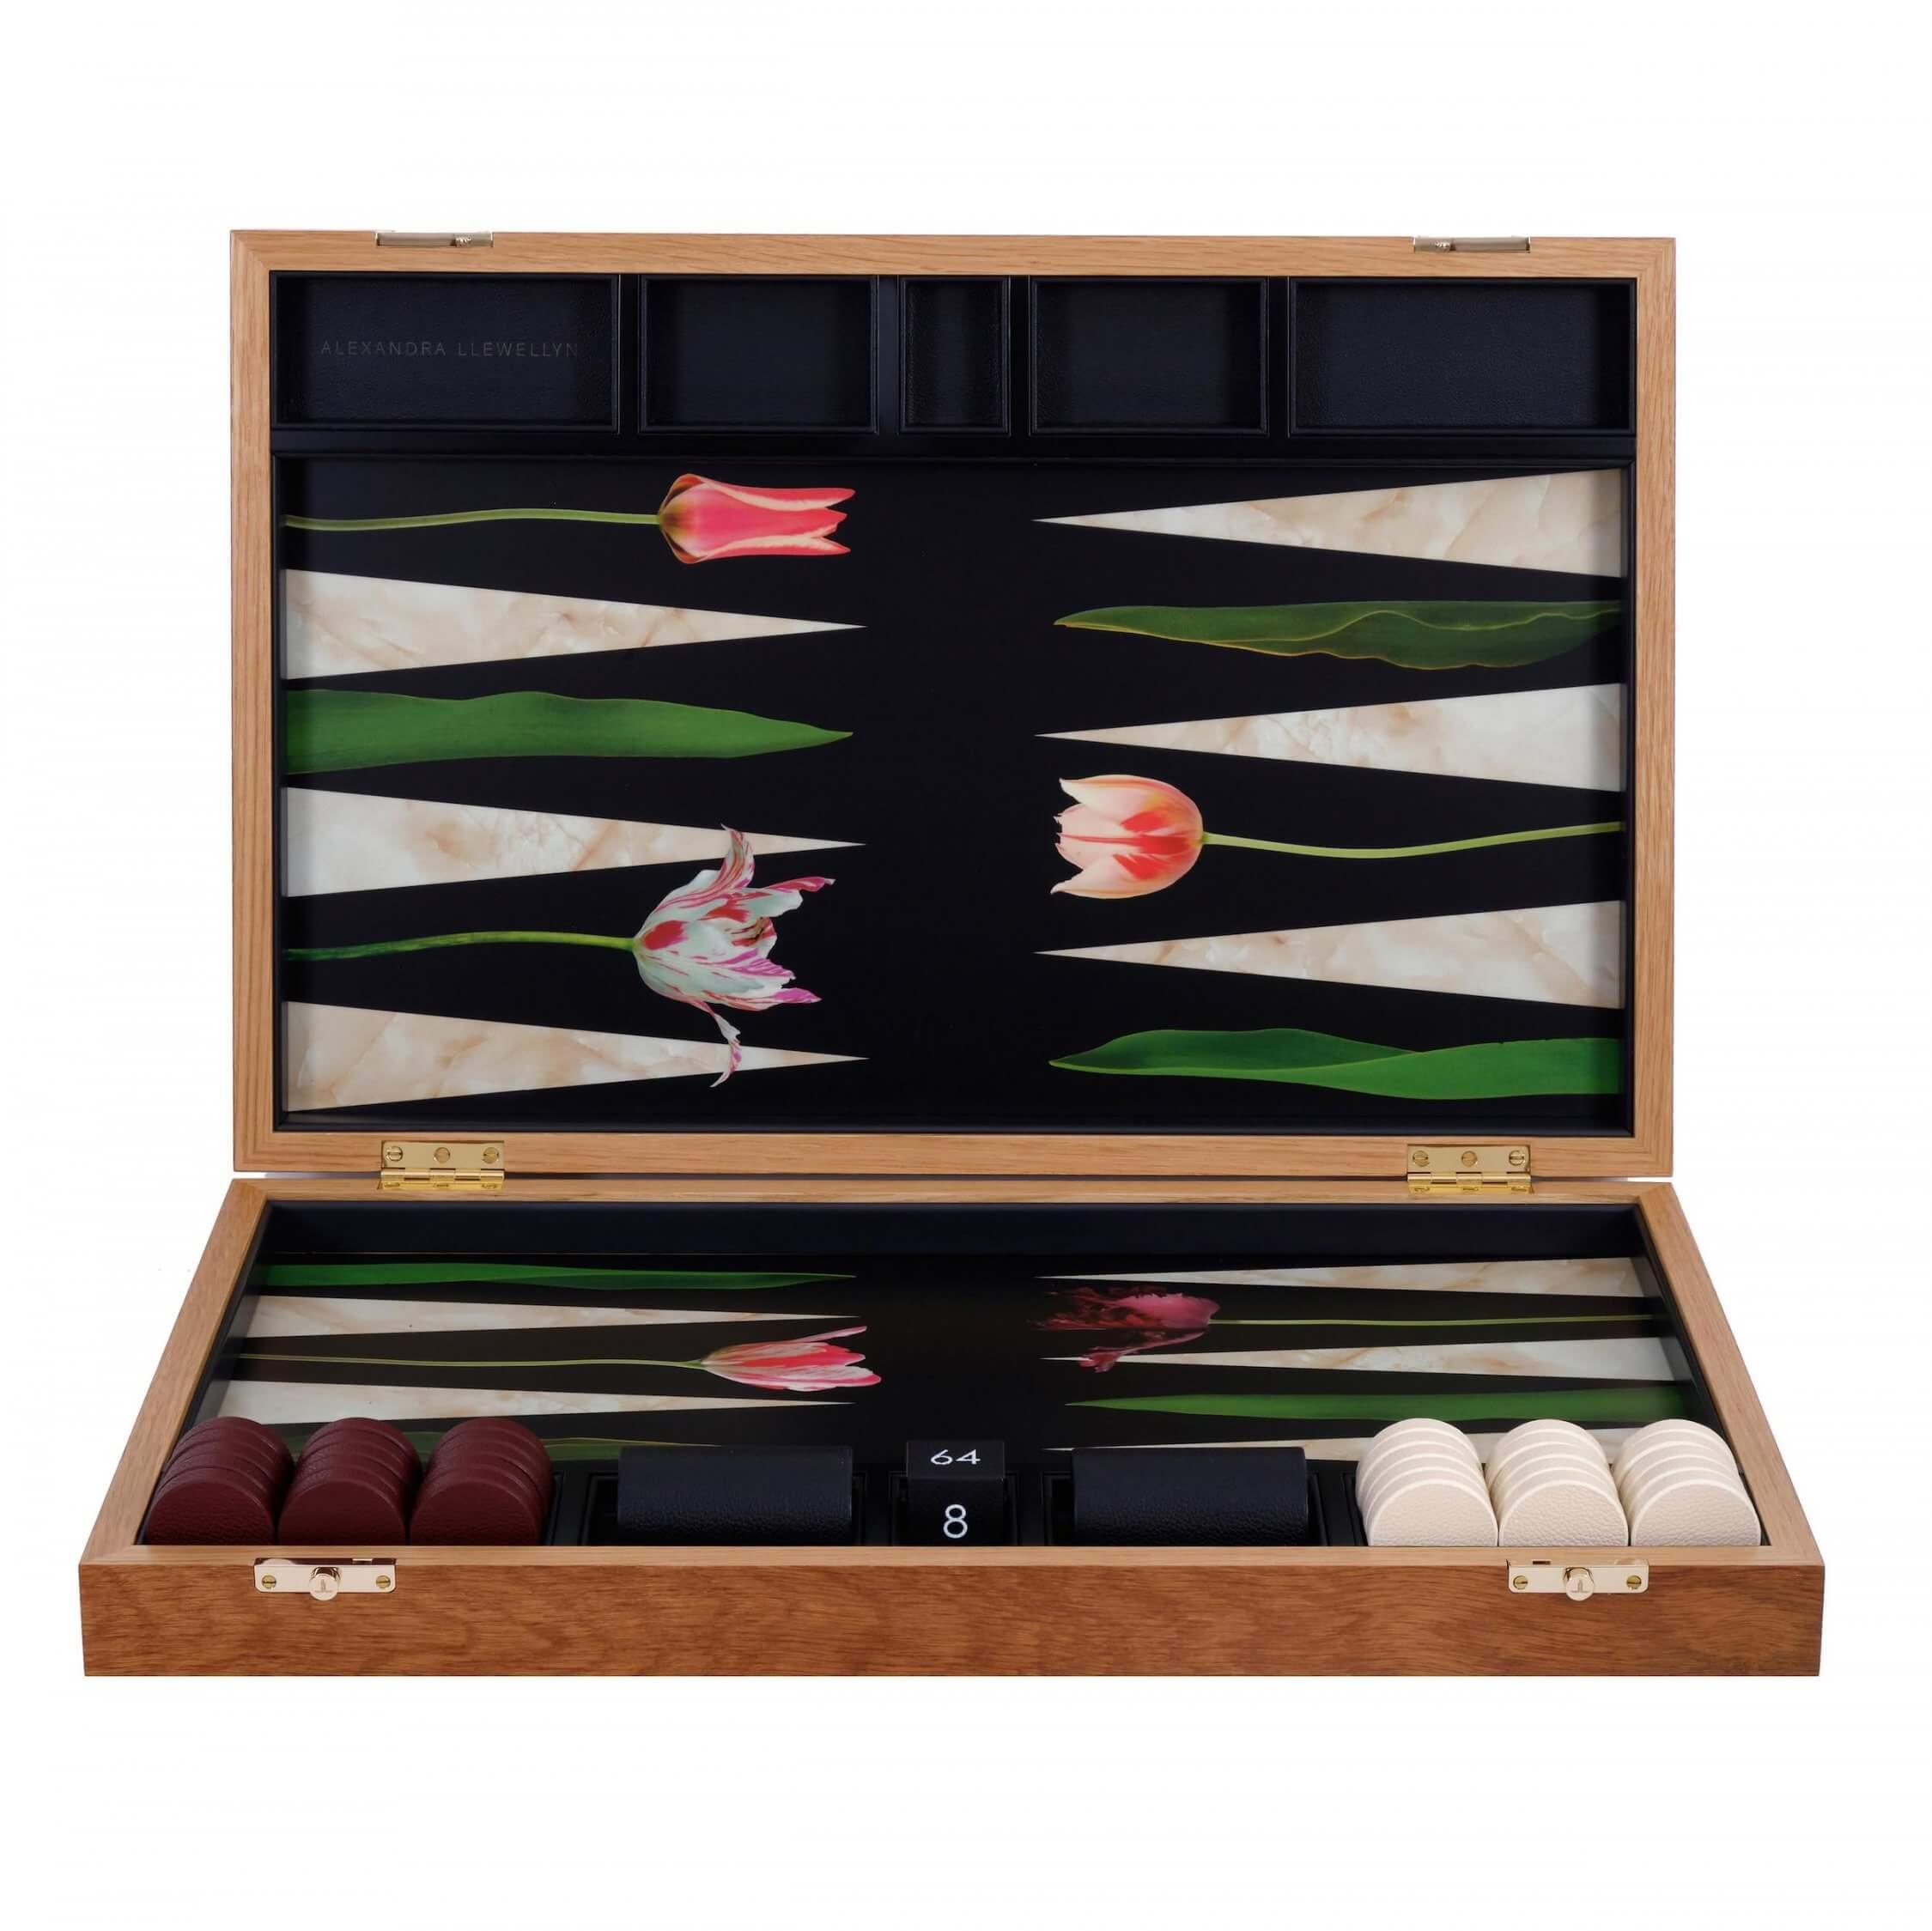 Alexandra Llewellyn Tulip Backgammon Set upright